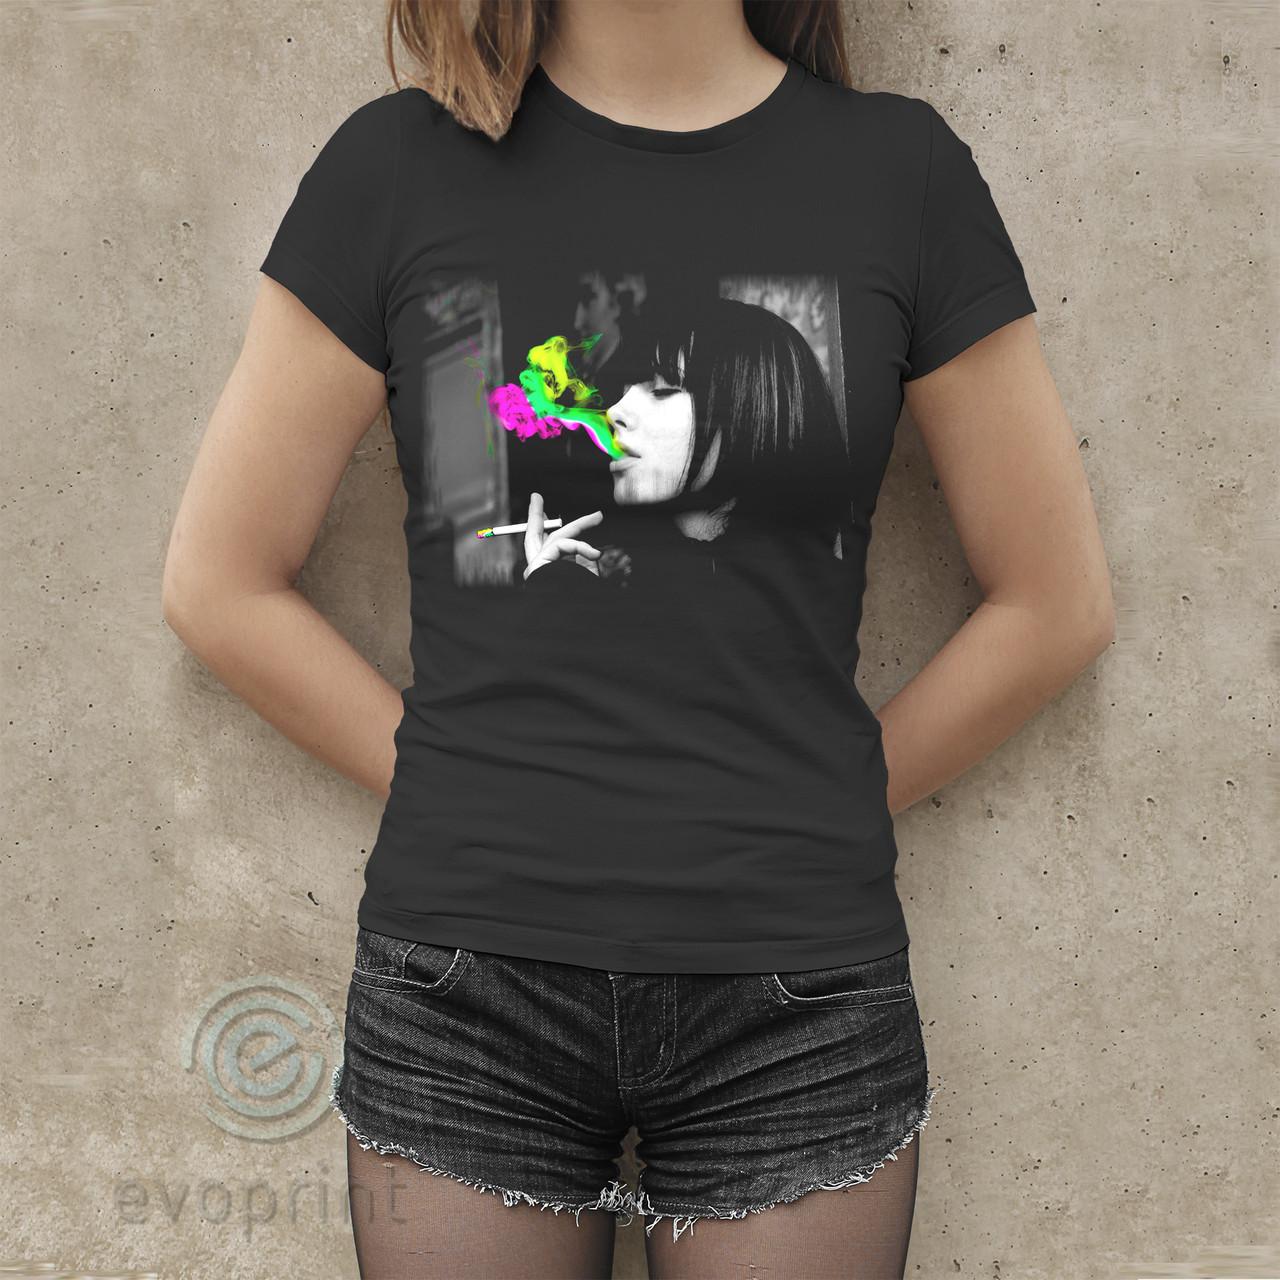 Накатка на чёрные футболки